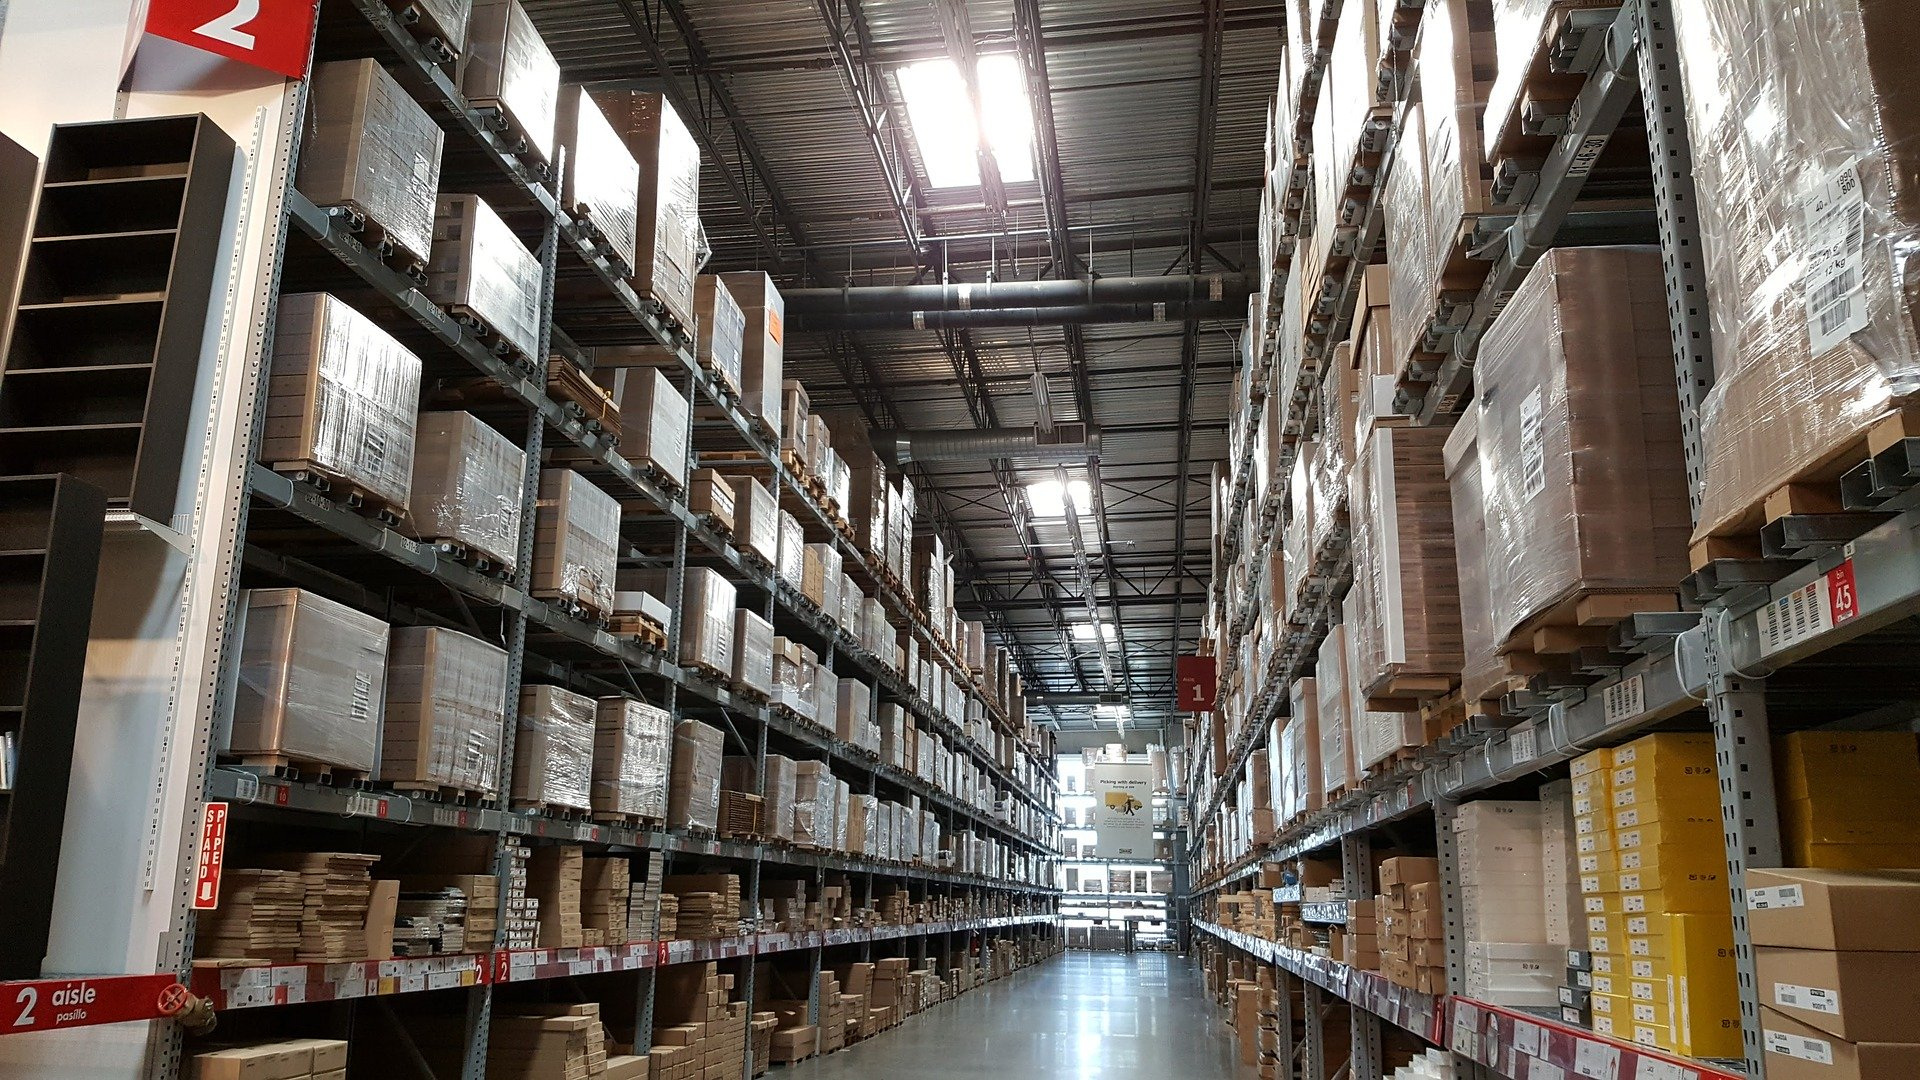 E-commerce major Amazon India to set up 10 new Fulfilment Centers across India